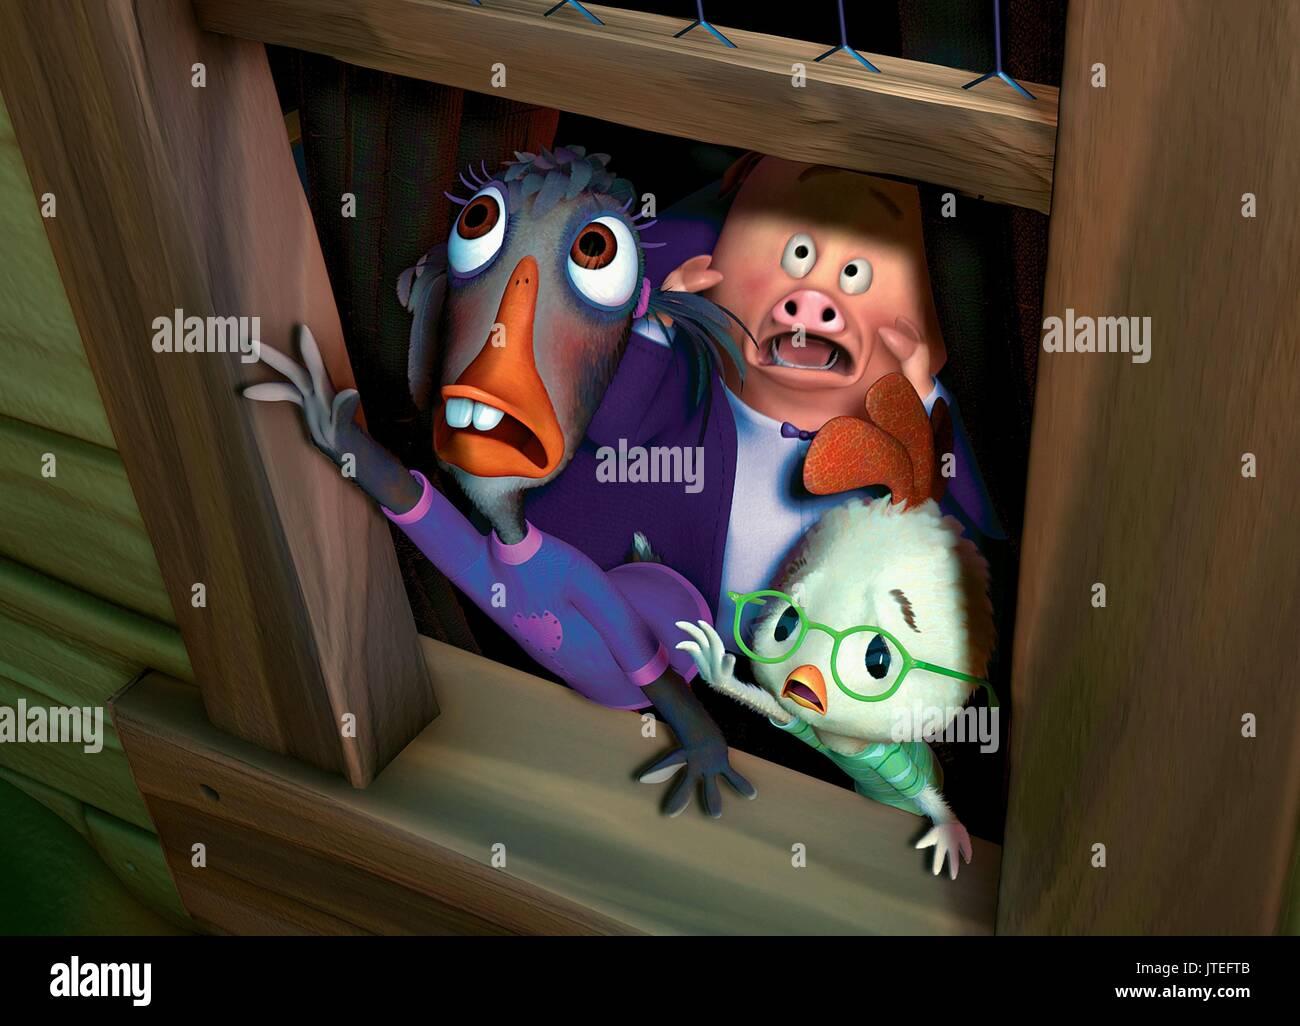 Ugly Duckling Runt Chicken Little Chicken Little 2005 Stock Photo Alamy